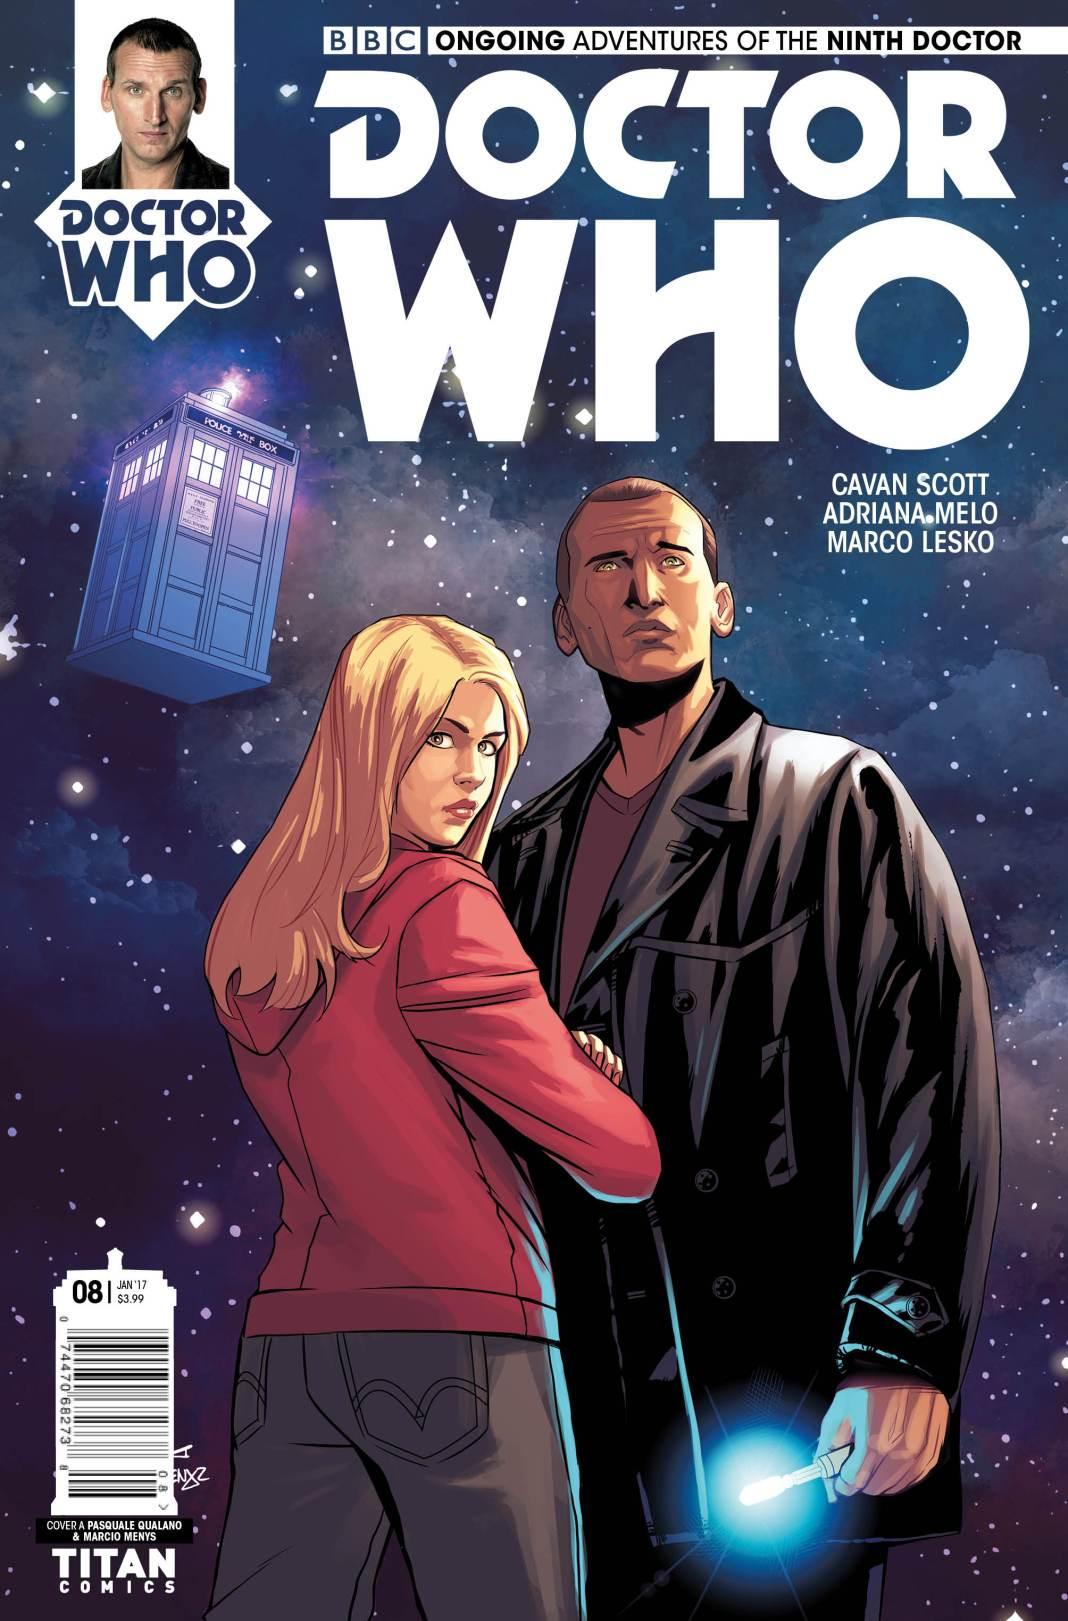 TITAN COMICS - NINTH DOCTOR #8 COVER B BY PASQUALE QUALANO